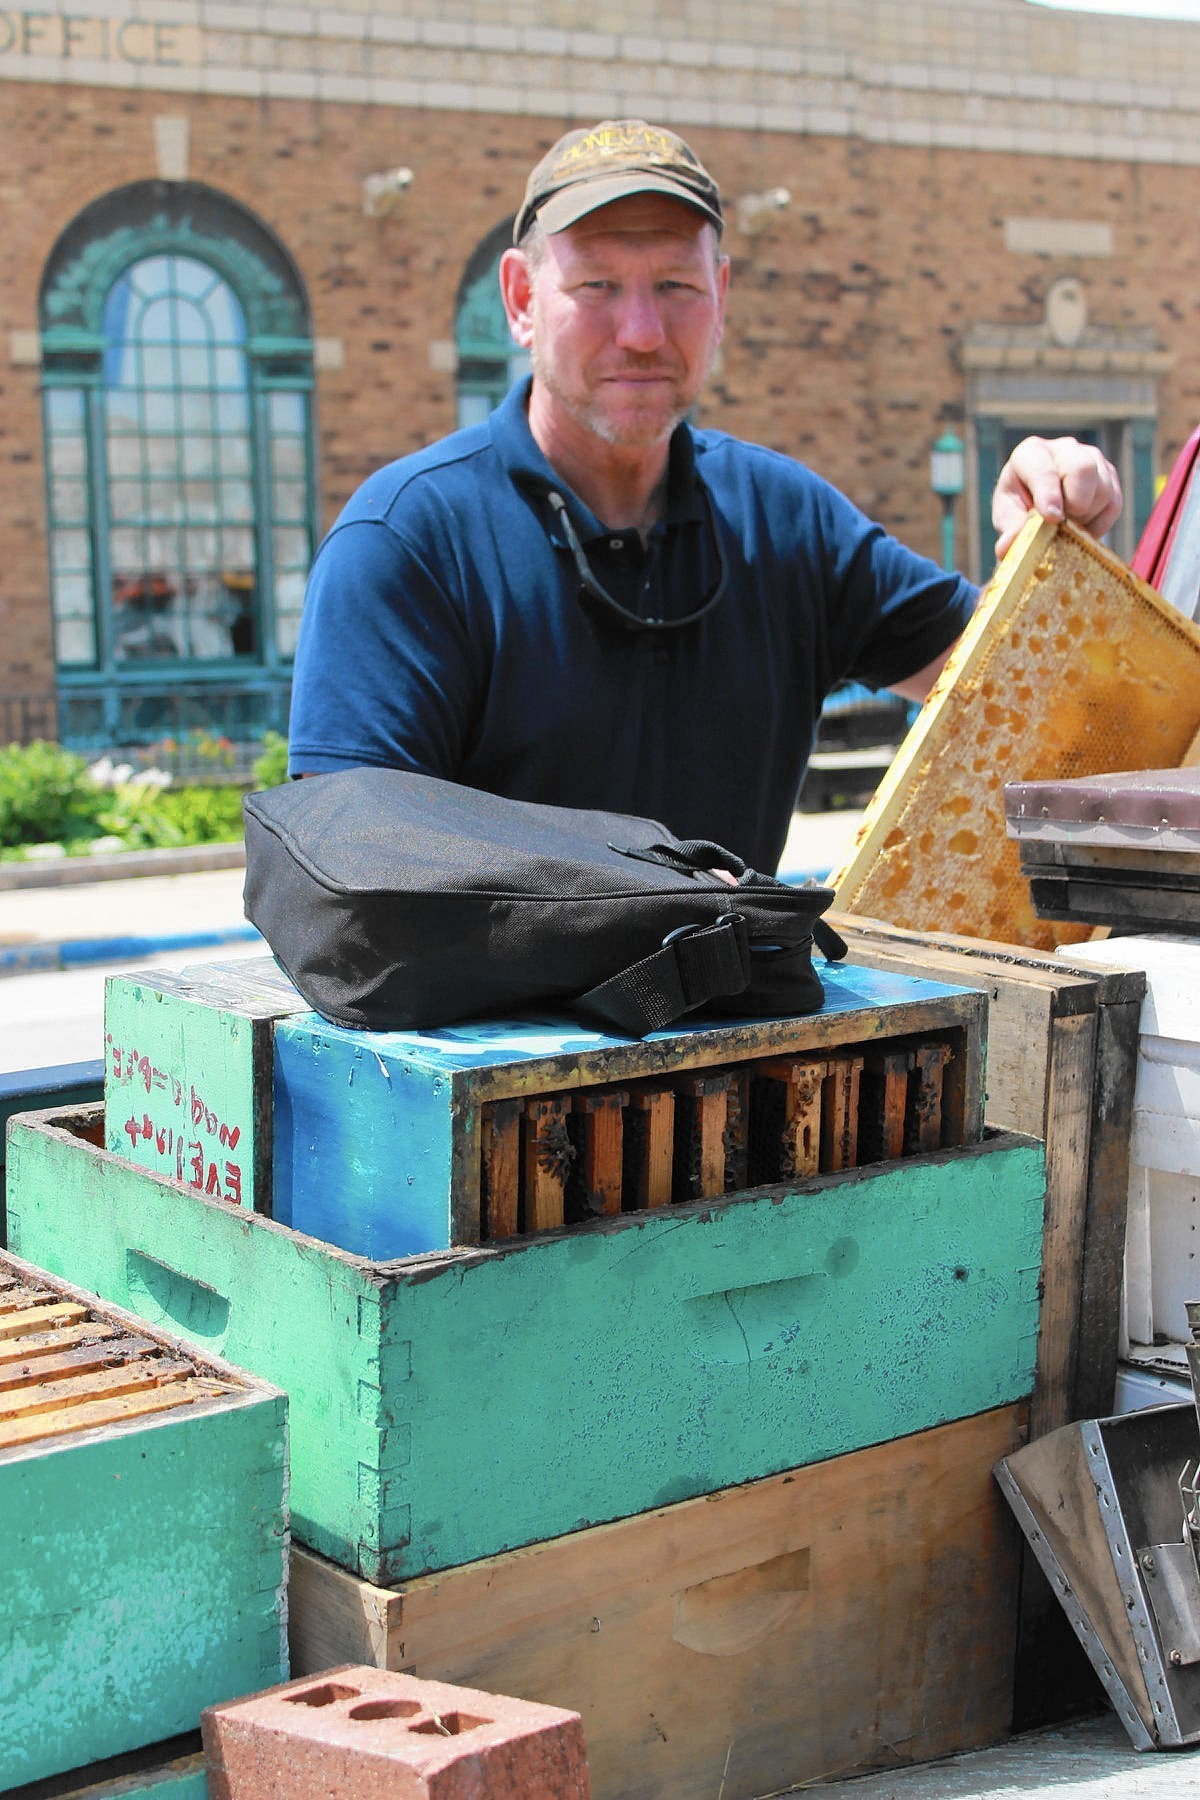 Beekeeper educates people about honey